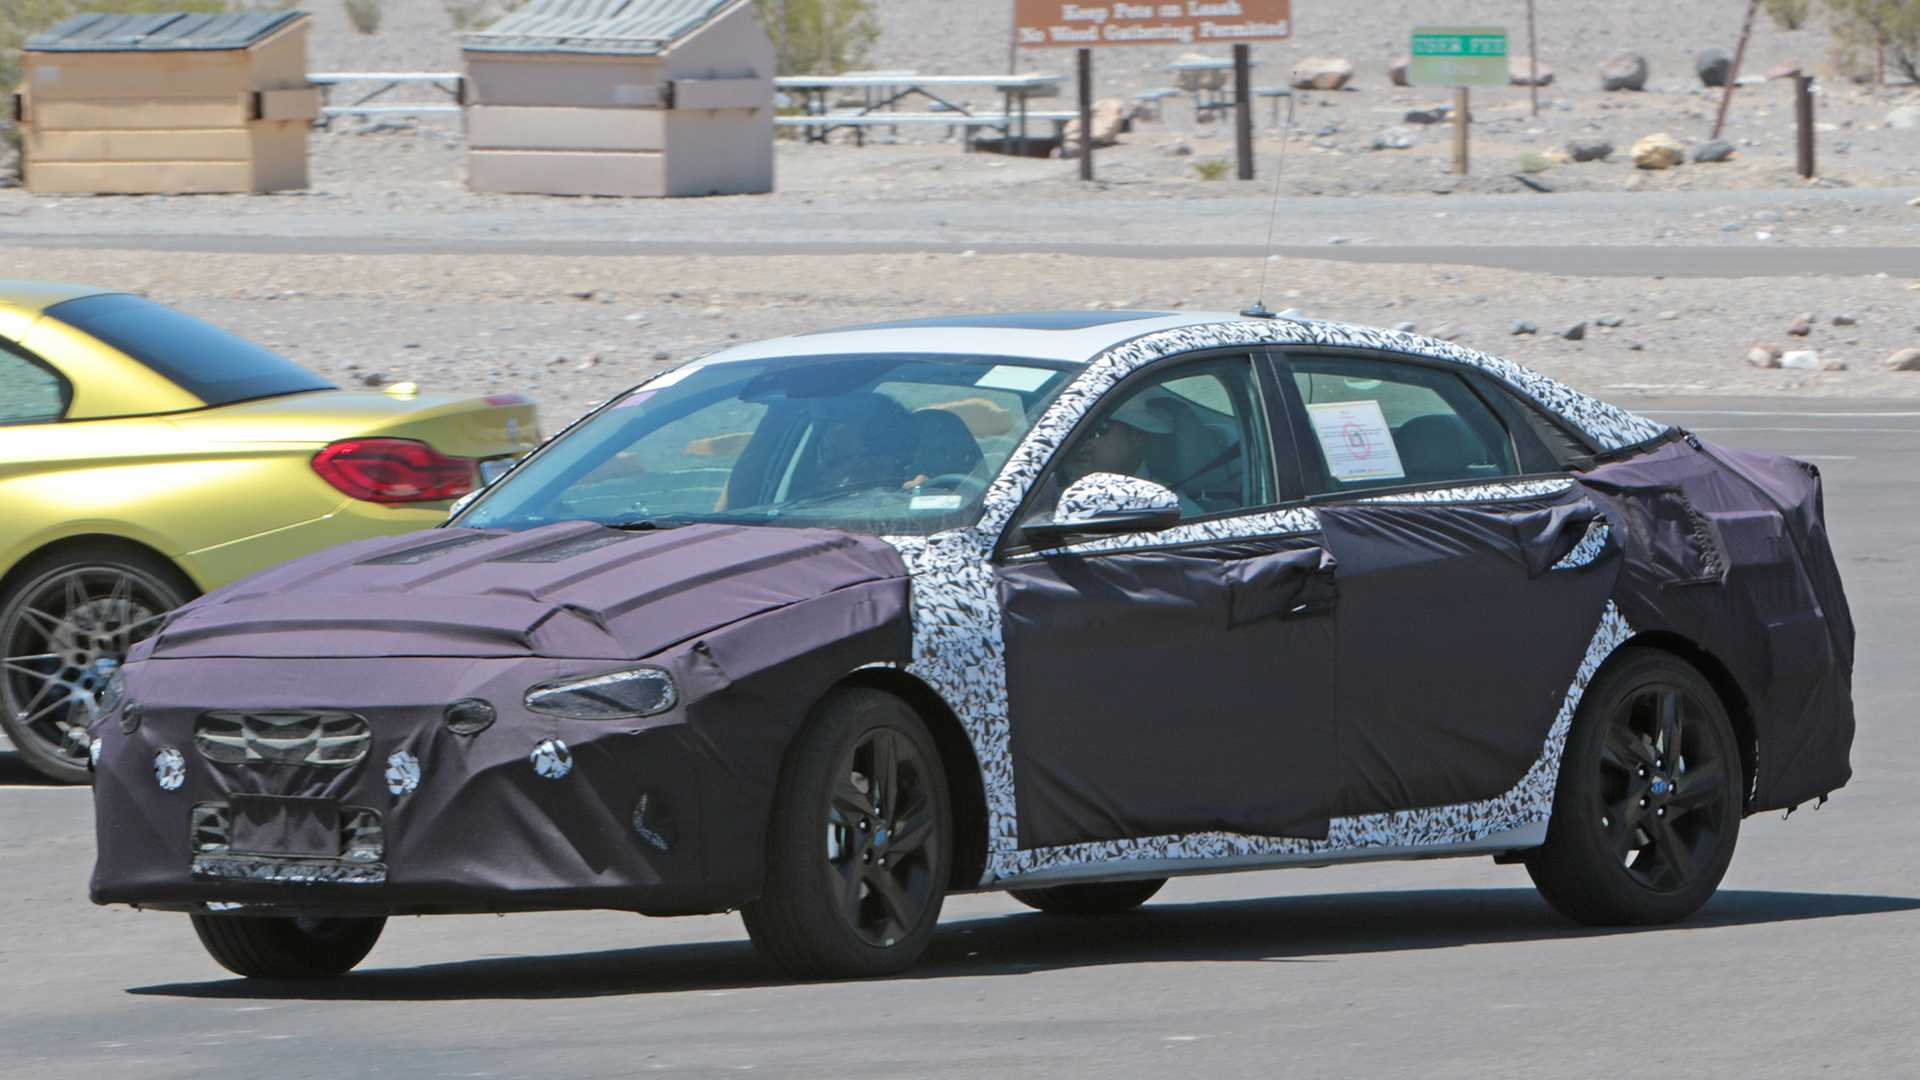 Next-Gen Hyundai Elantra Spied For the First Time 1